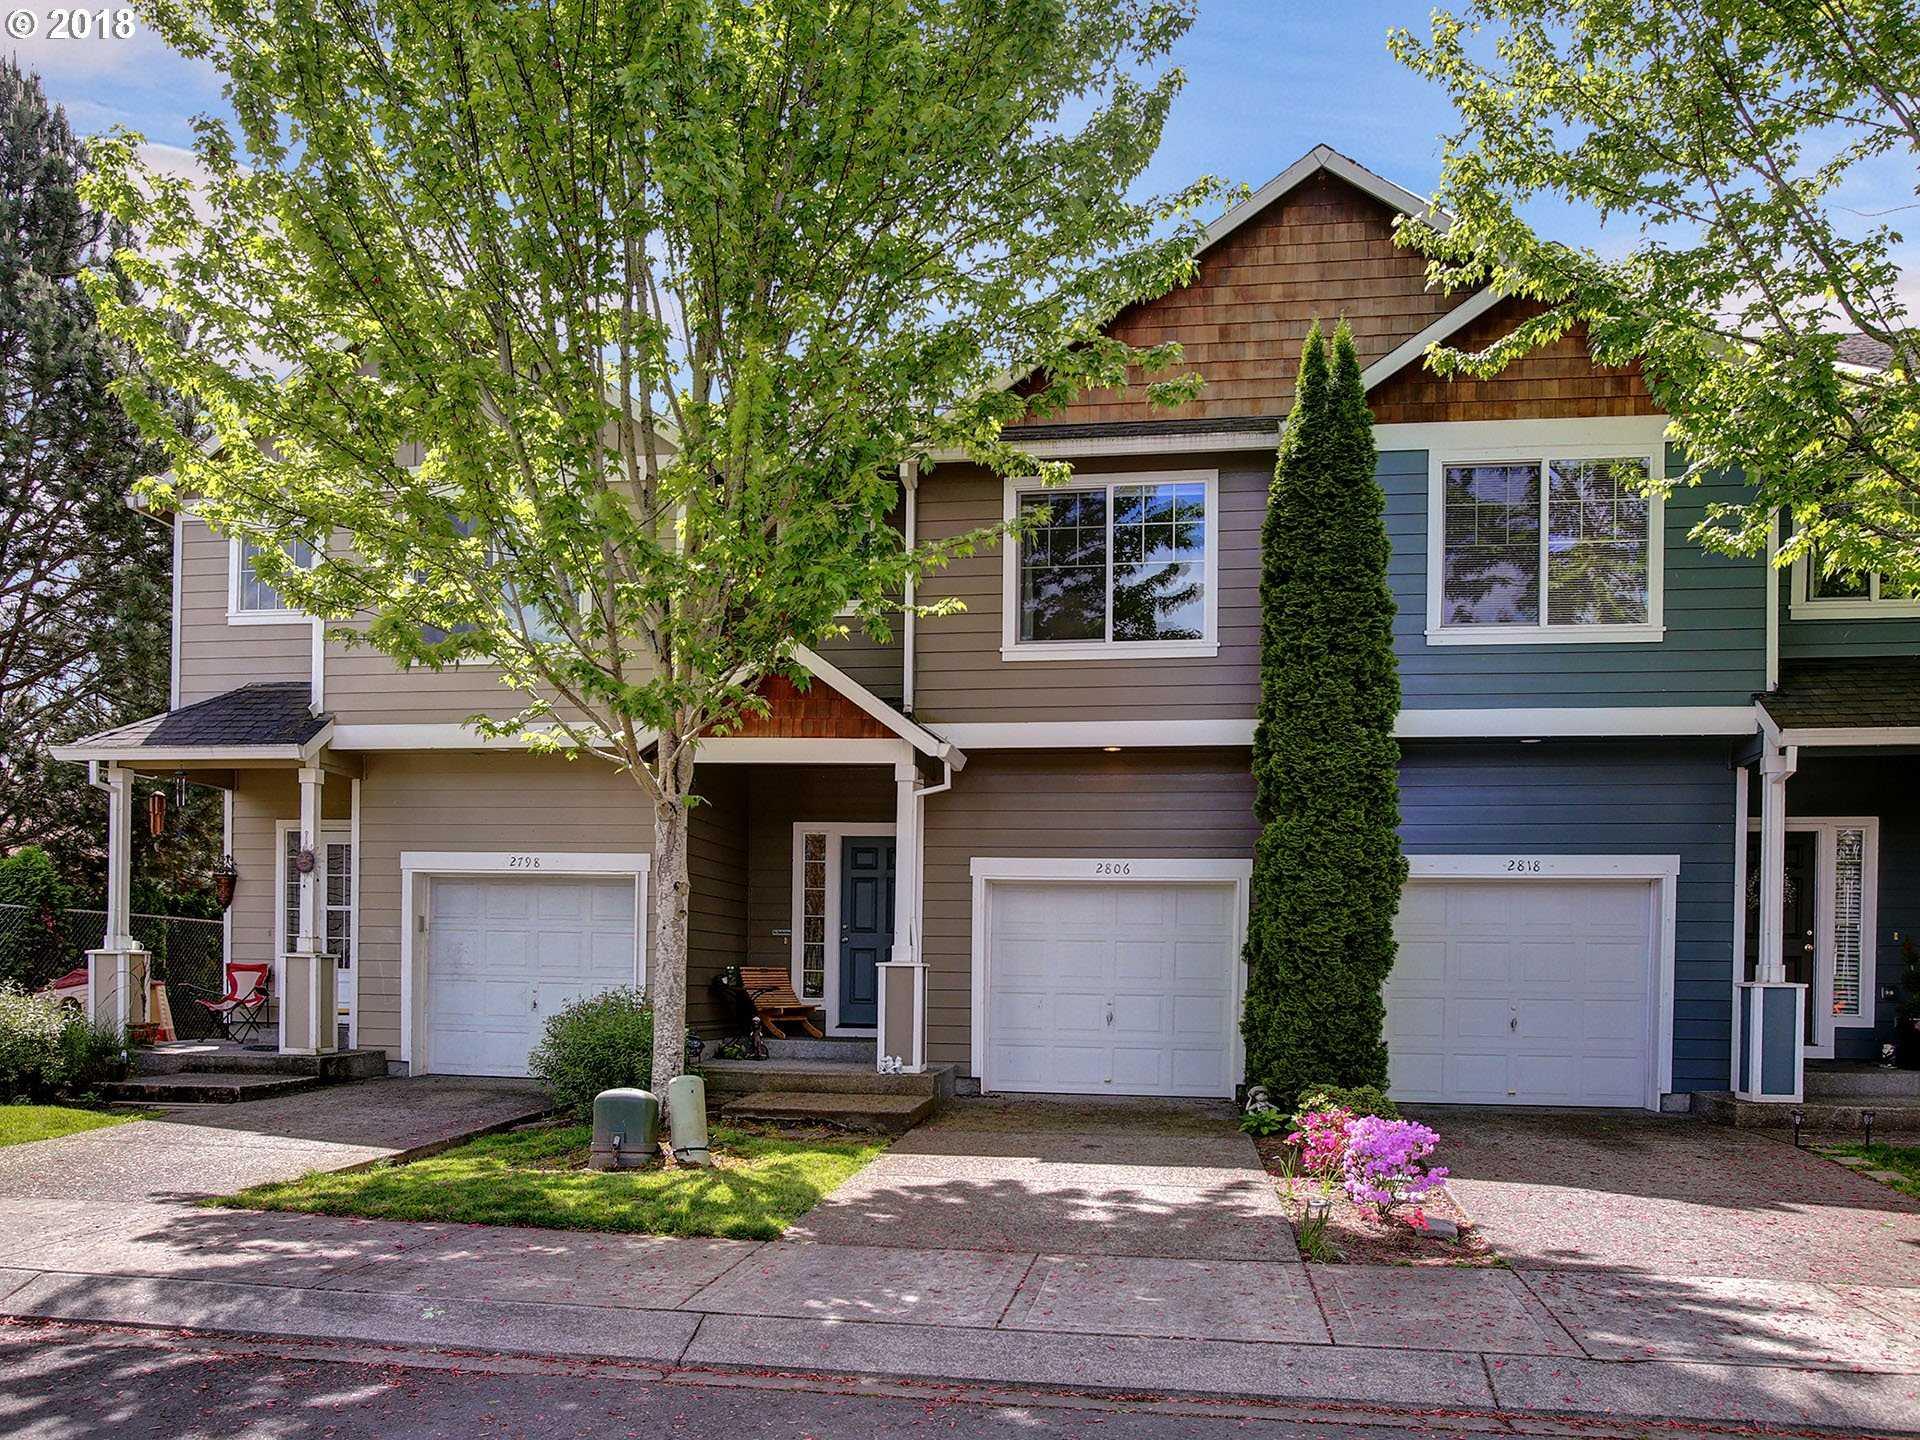 $275,000 - 3Br/3Ba -  for Sale in Hillsboro